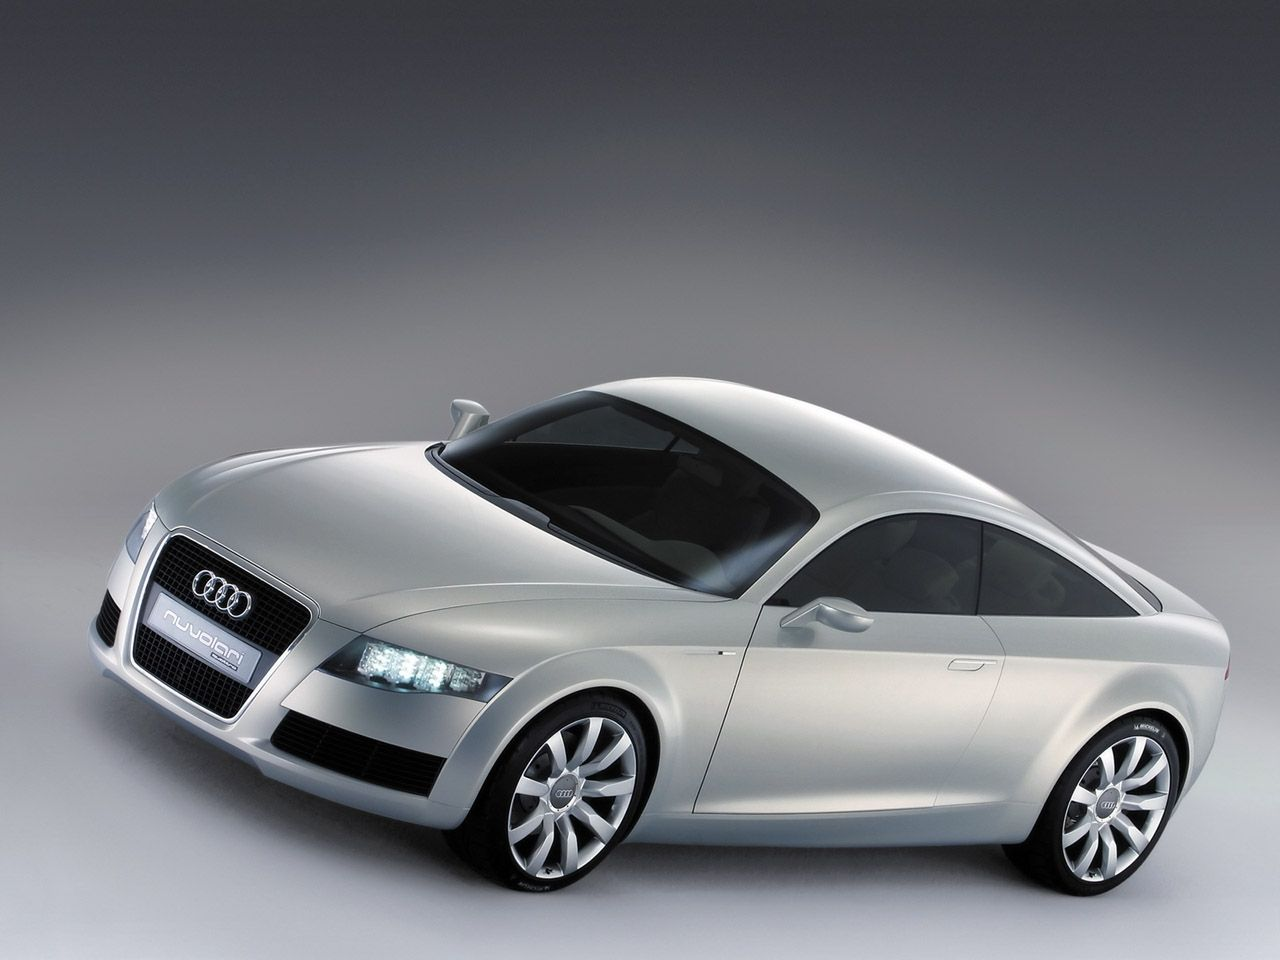 Audi Nuvolari Audi Audi Cars Concept Cars